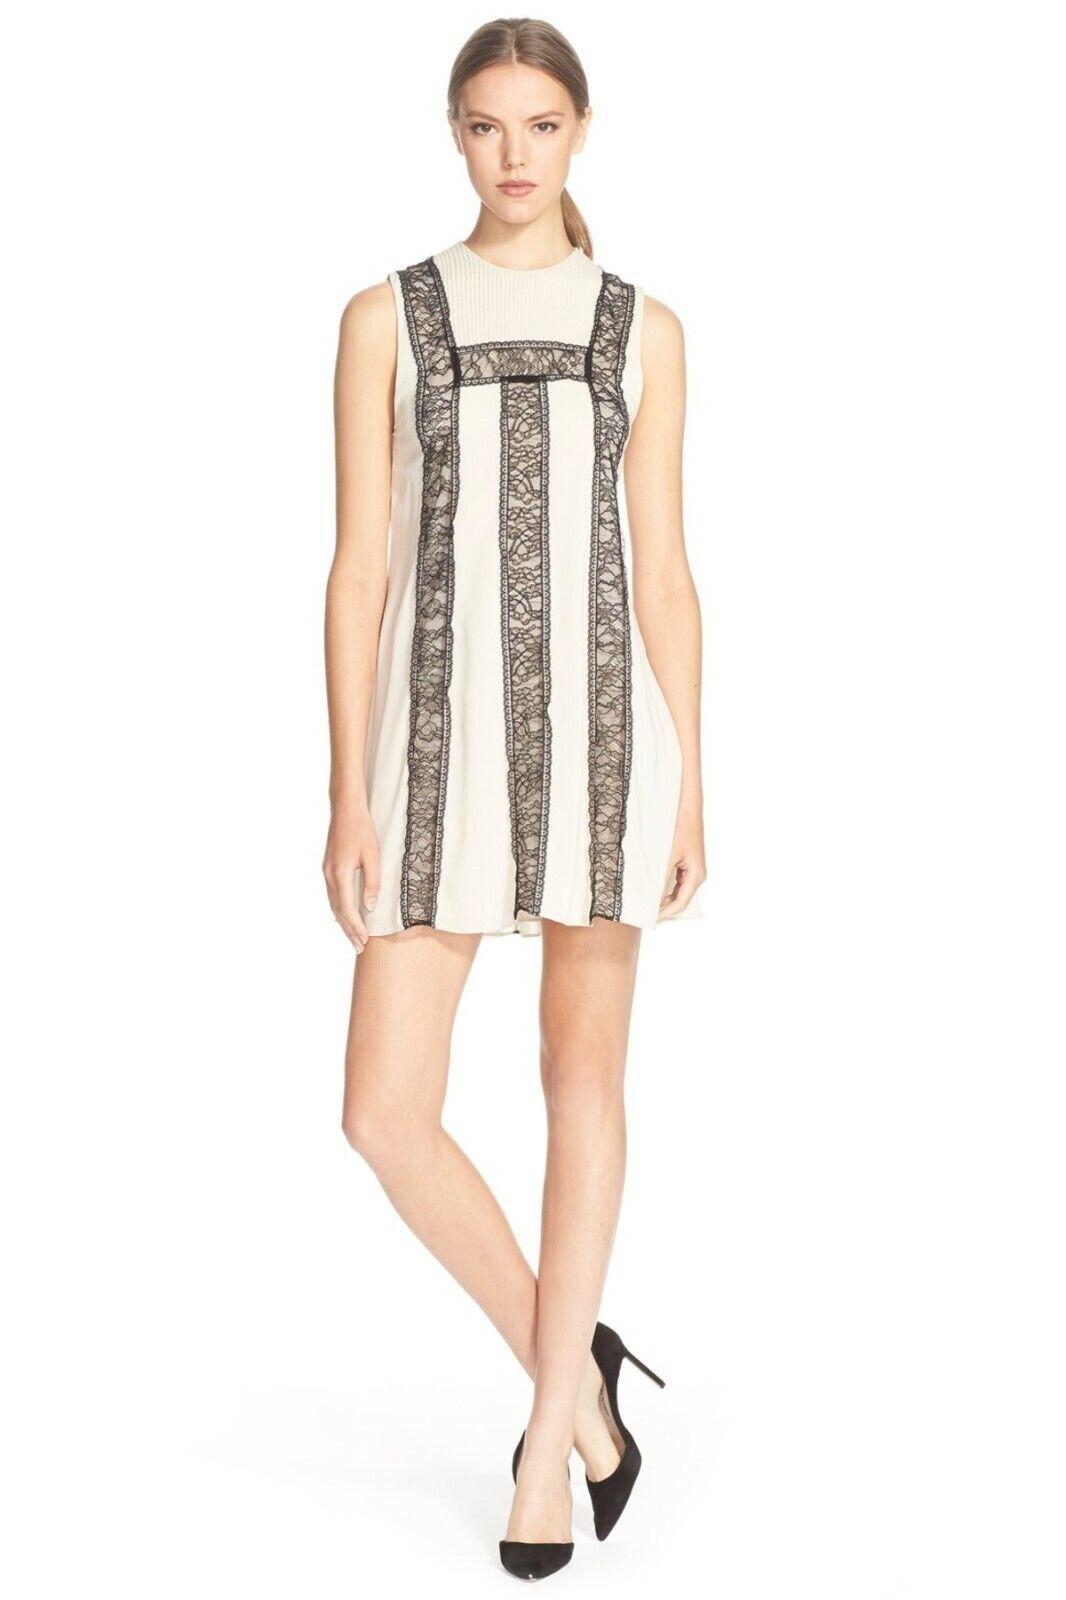 NEW Alice + Olivia Edwina Lace Accent Shift Dress in Beige - Größe 12  D2126